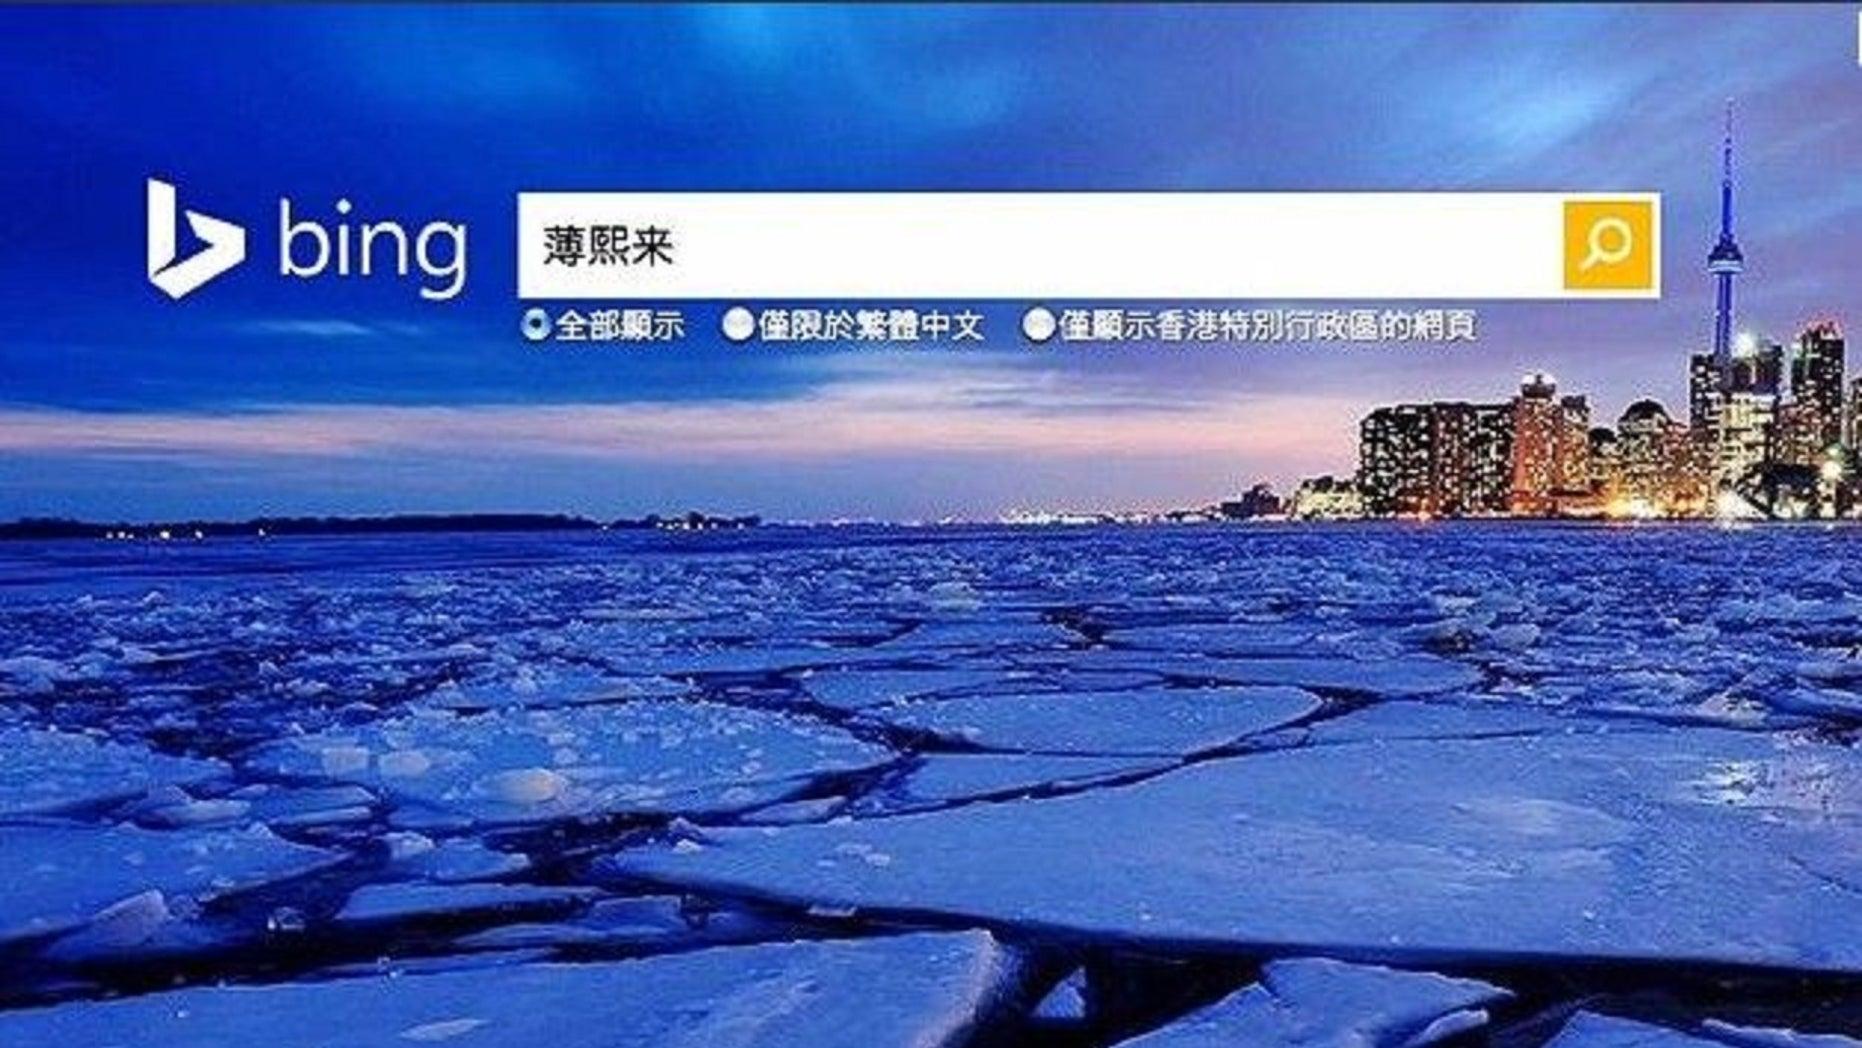 Microsoft Corp said China has blocked its Bing search engine.